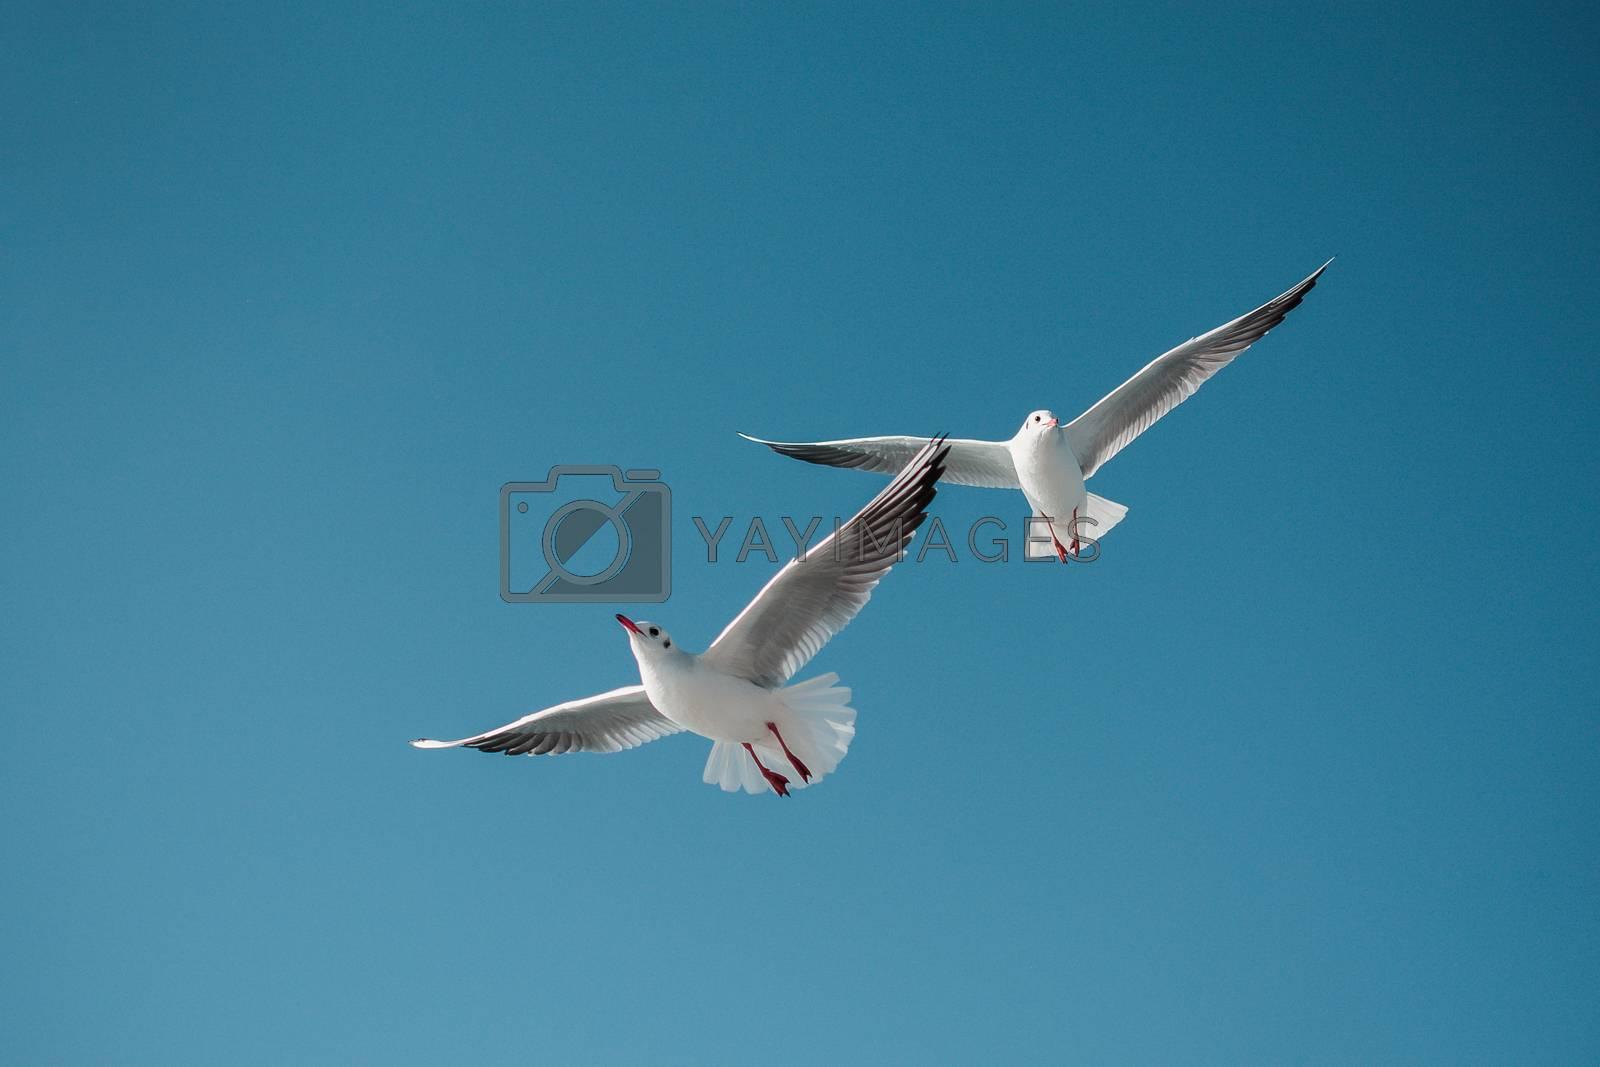 Seagulls flying in the sky by berkay